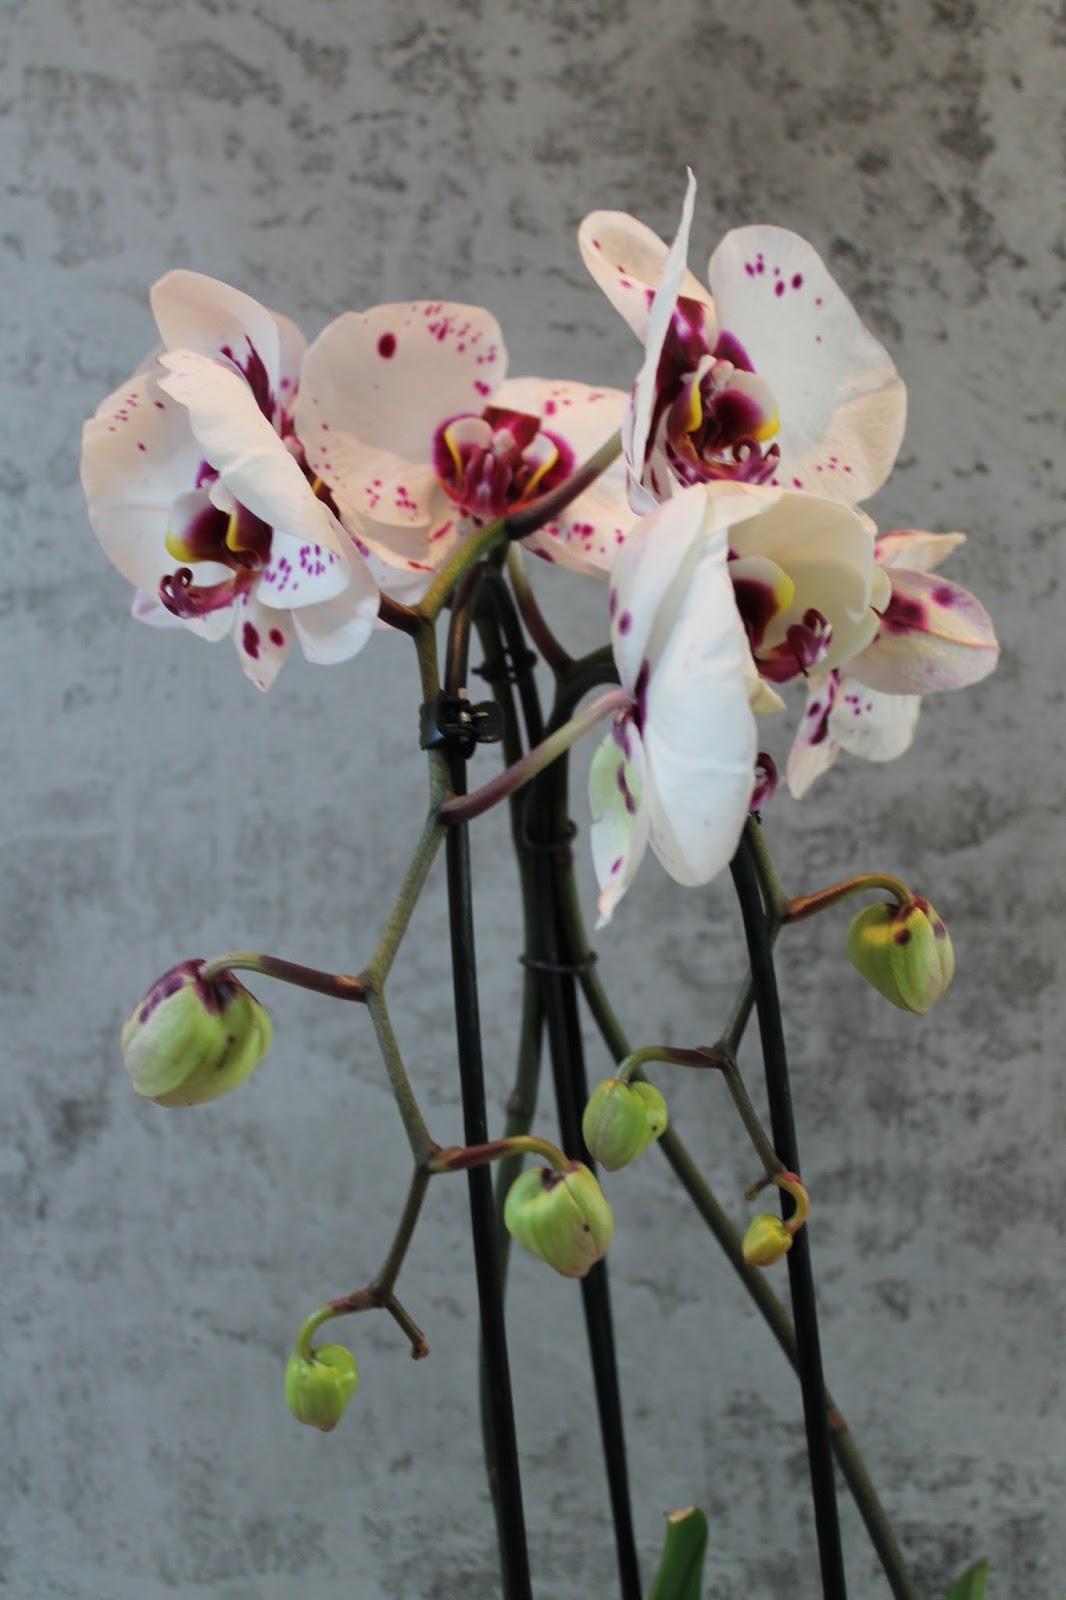 beates kreative welten phalaenopsis orchidee royal dalmation cascade. Black Bedroom Furniture Sets. Home Design Ideas